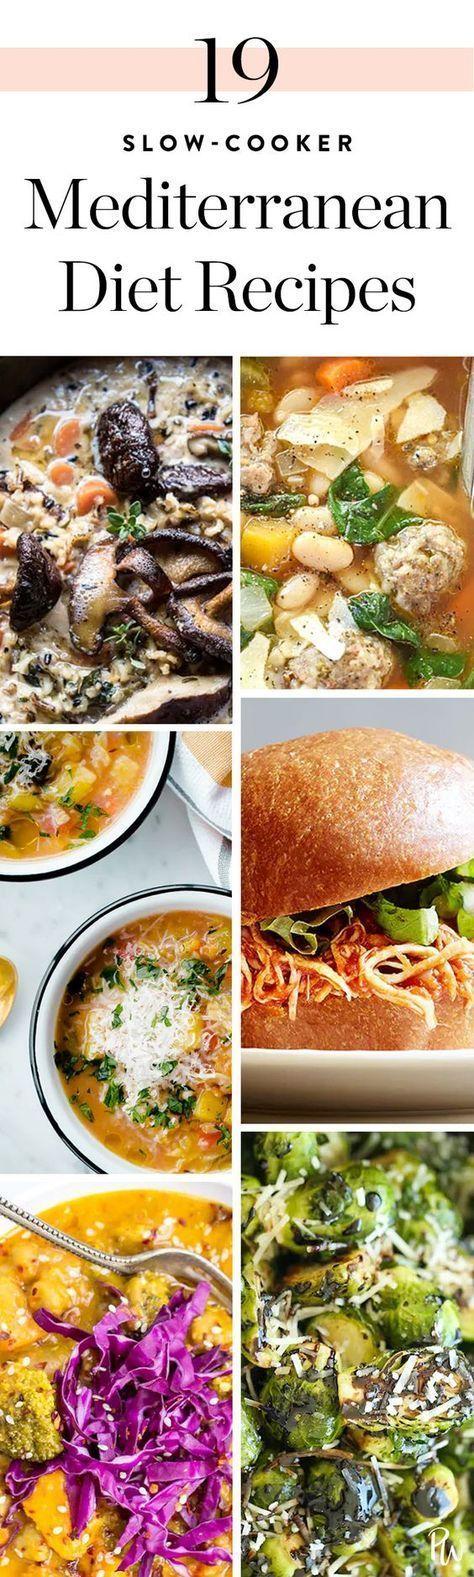 19 Mediterranean Diet Recipes You Can Make in Your Slow-Cooker. #slowcooker #mediterraneandiet #mediterraneanrecipes #healthyrecipes #healthyfood